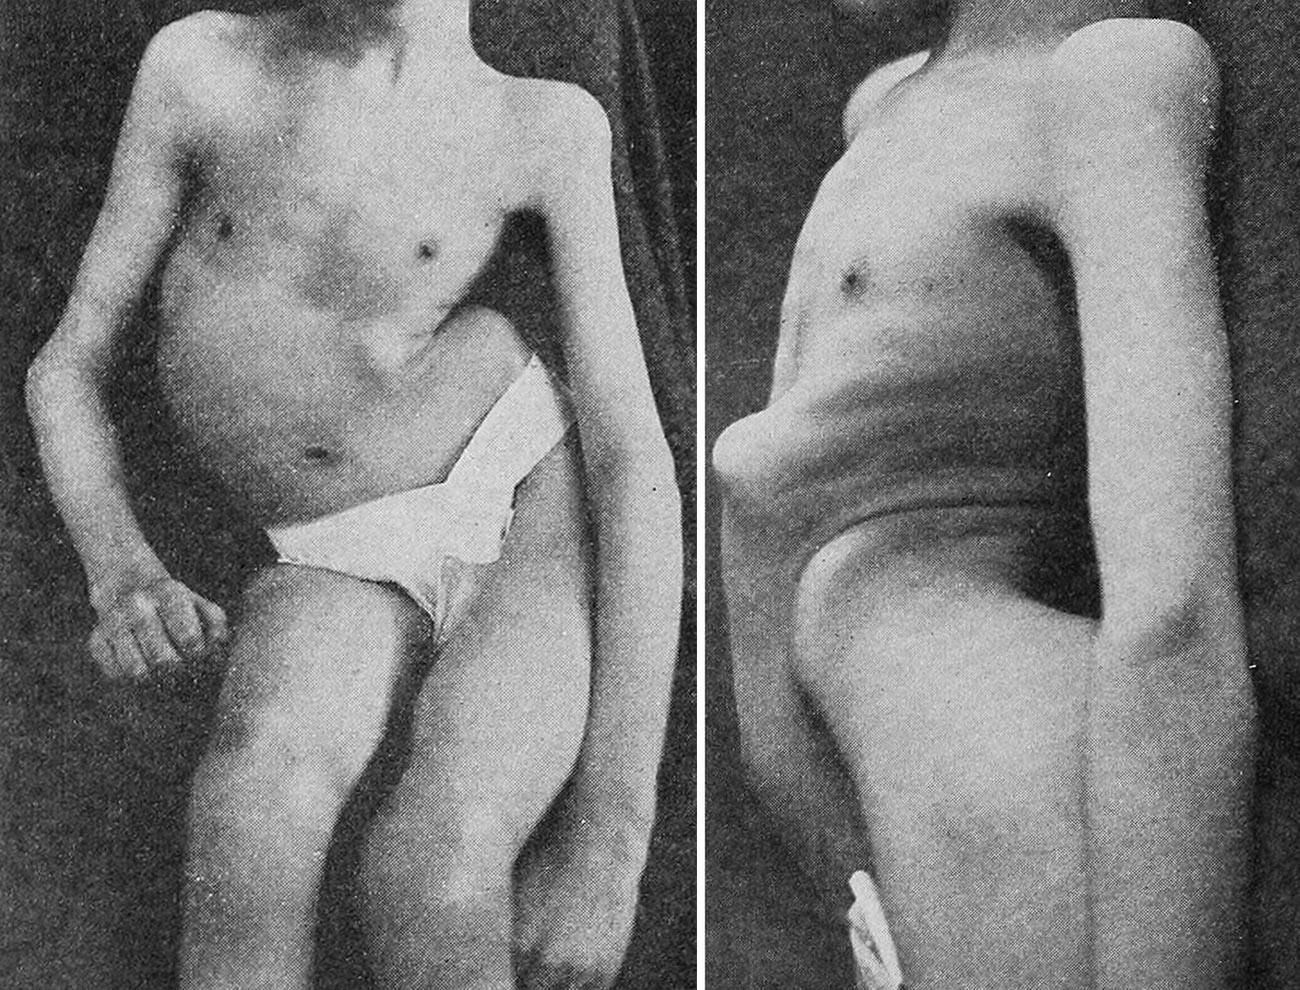 A boy with polio